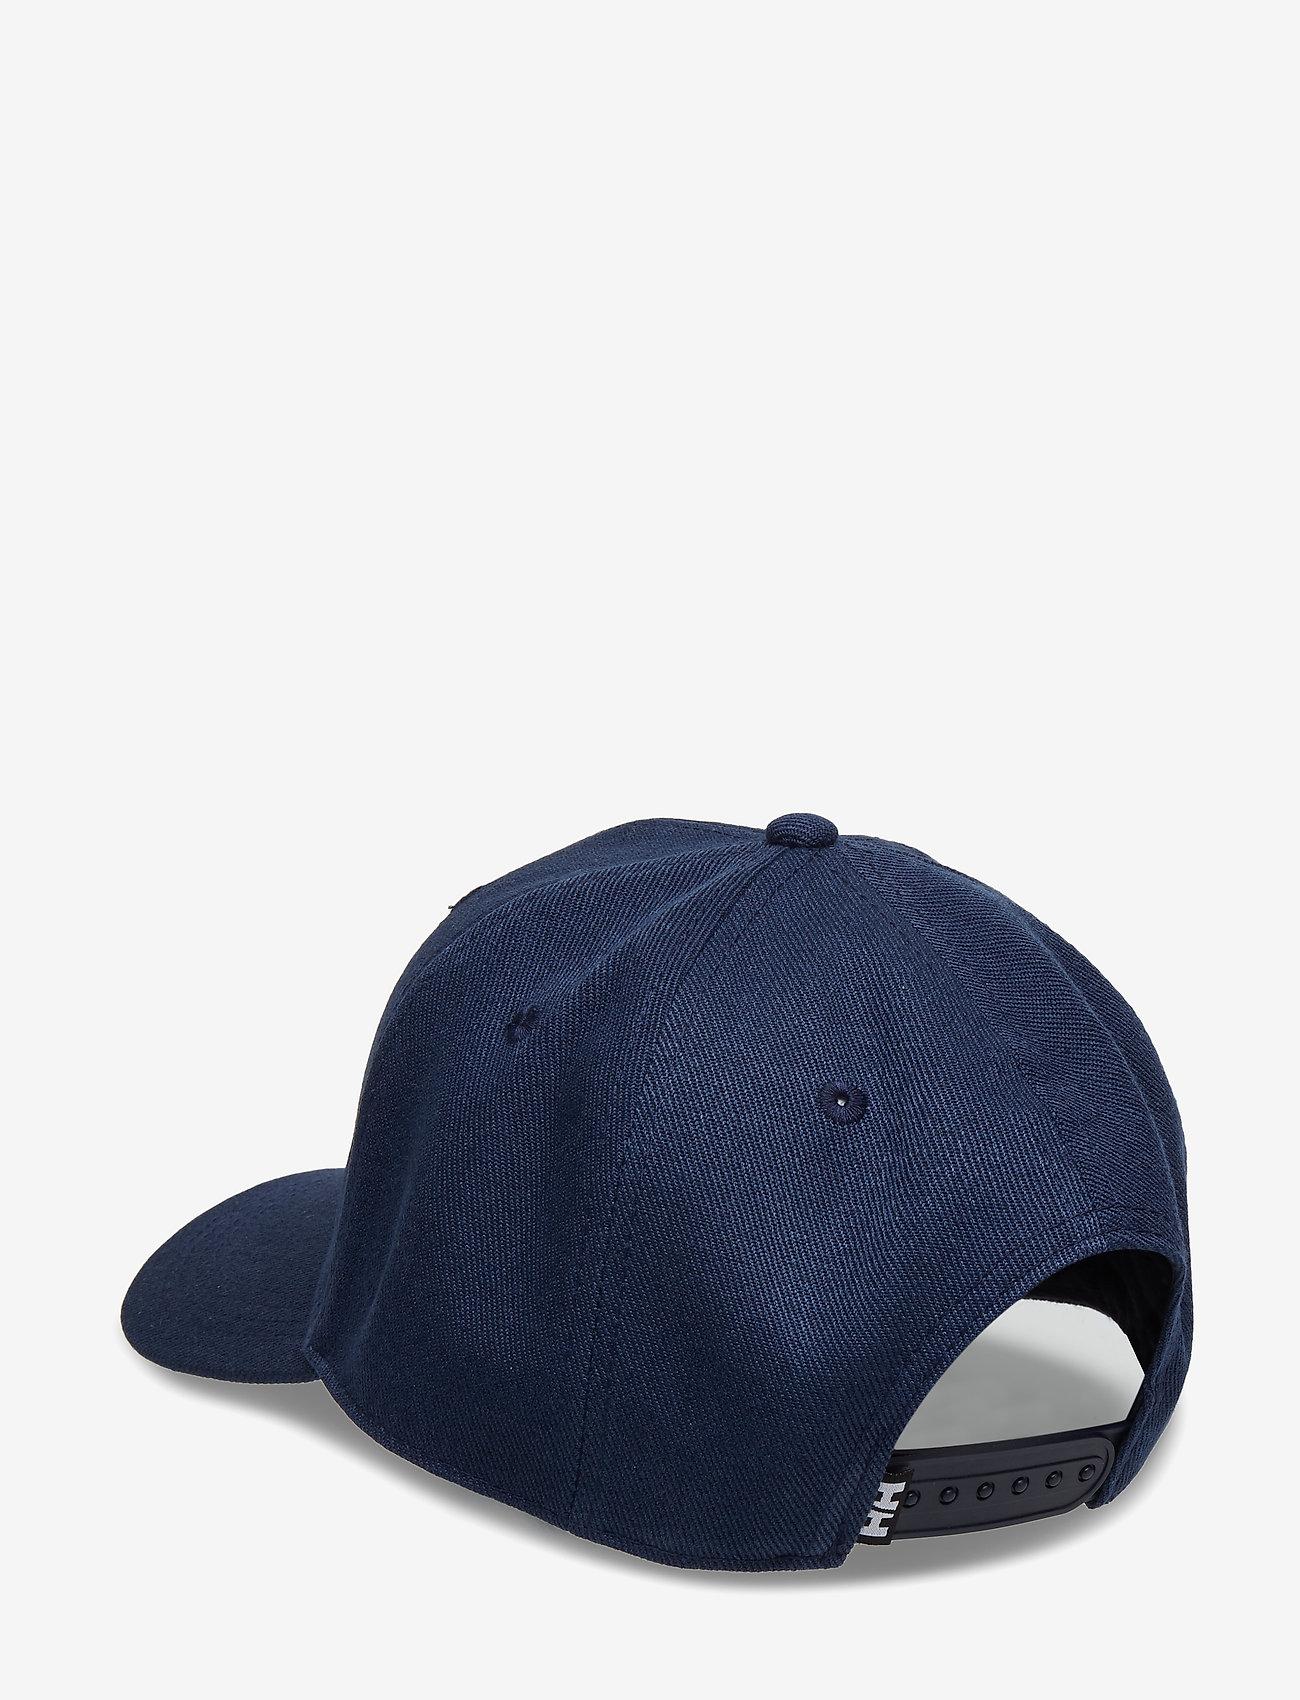 Helly Hansen - HH BRAND CAP - caps - 597 navy - 1